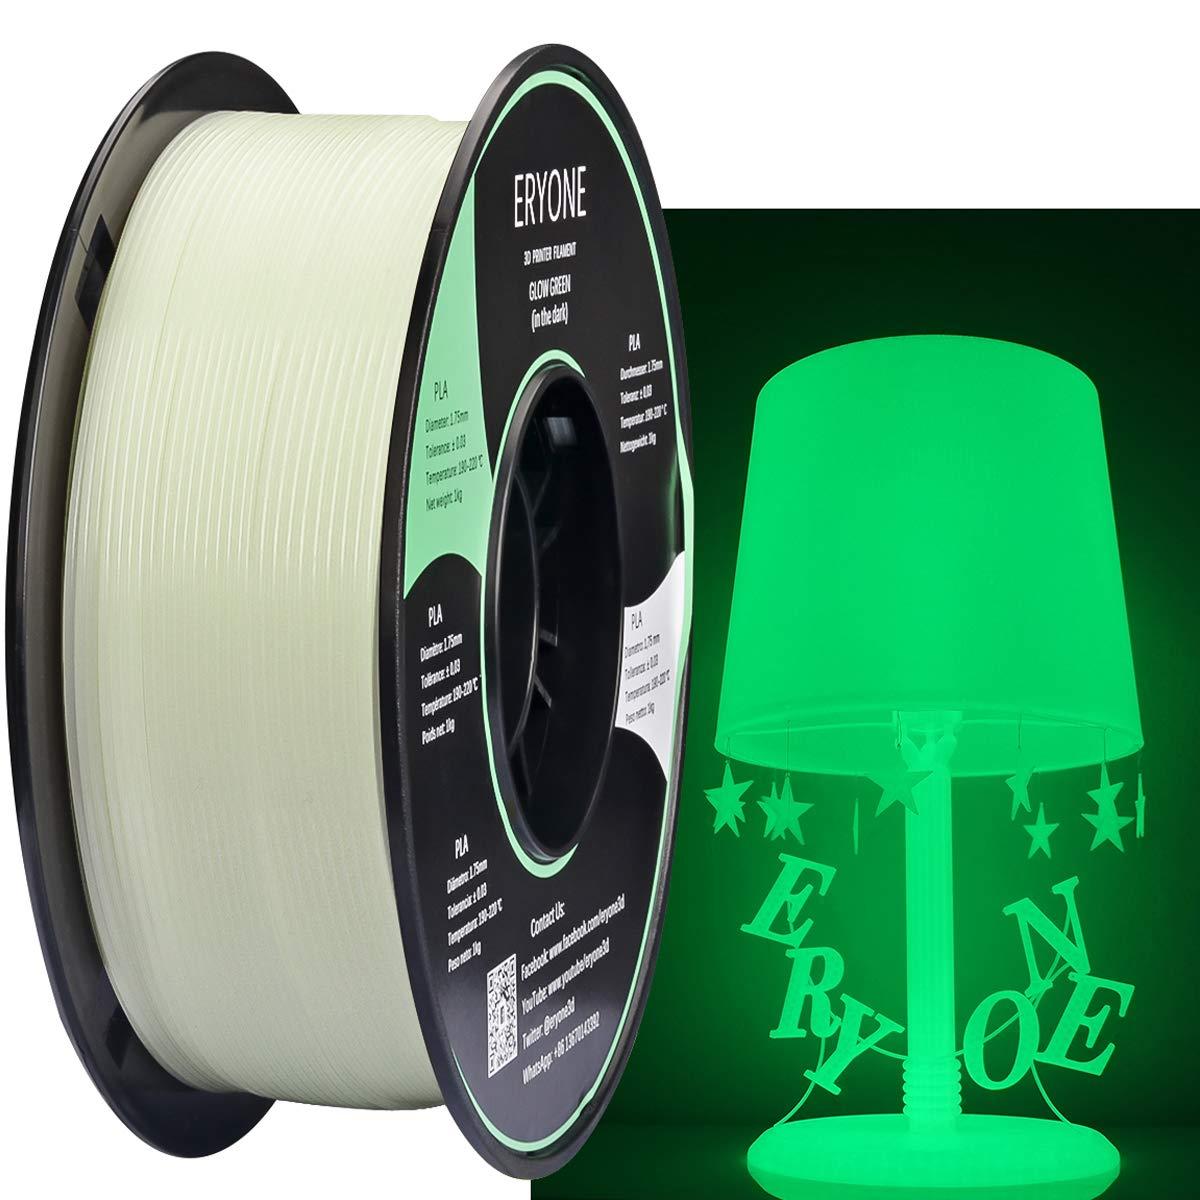 Eryone Glow Green in The Dark PLA 3D Printer Filament 1.75mm, Dimensional Accuracy +/- 0.05 mm, 1kg (2.2LBS) / Spool